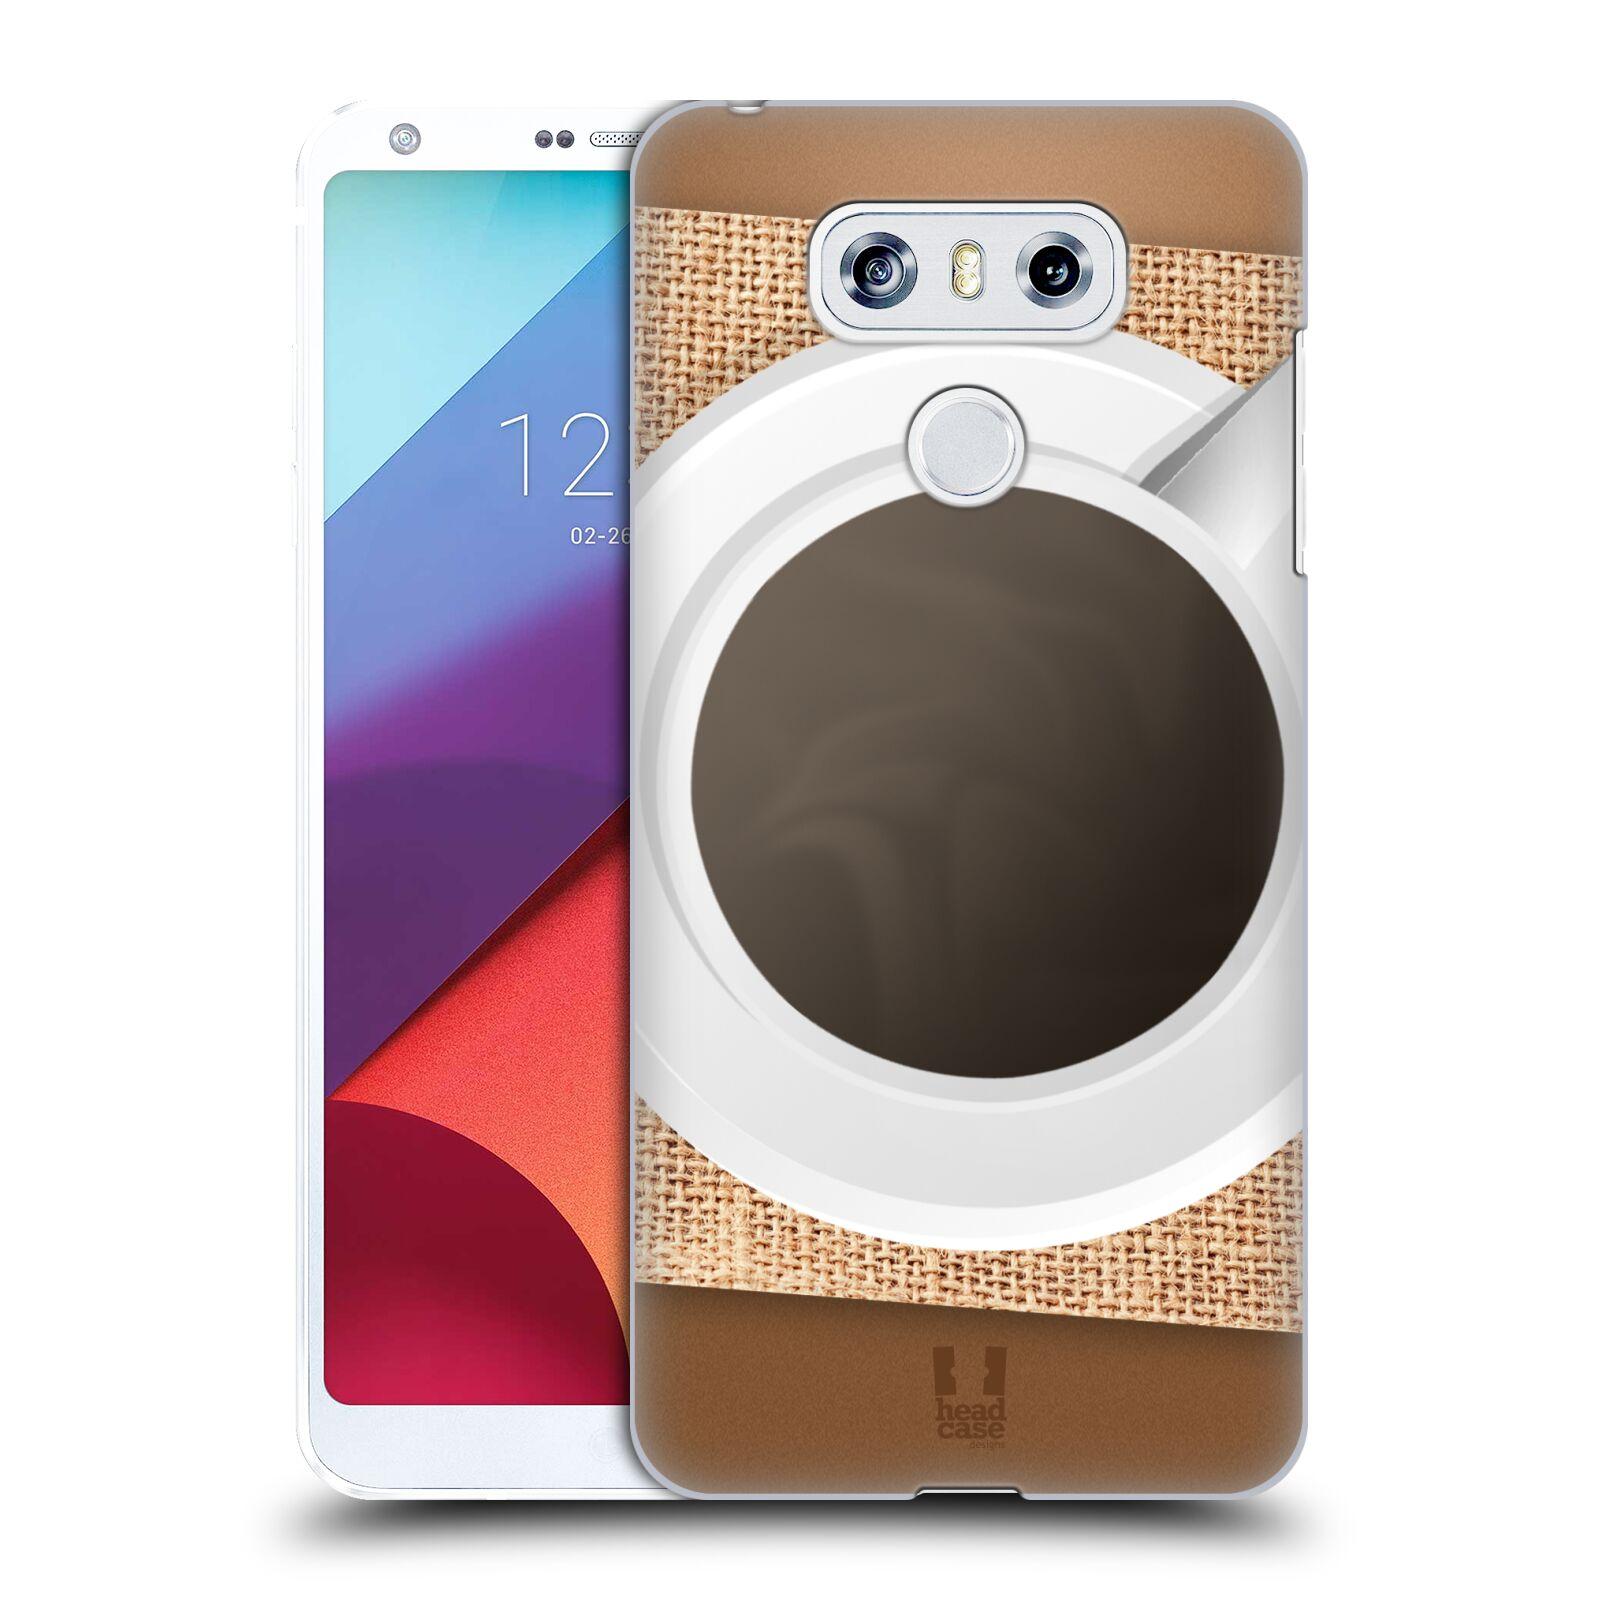 Funda trasera rígida Diseños Camaleón HEAD caso para LG G6